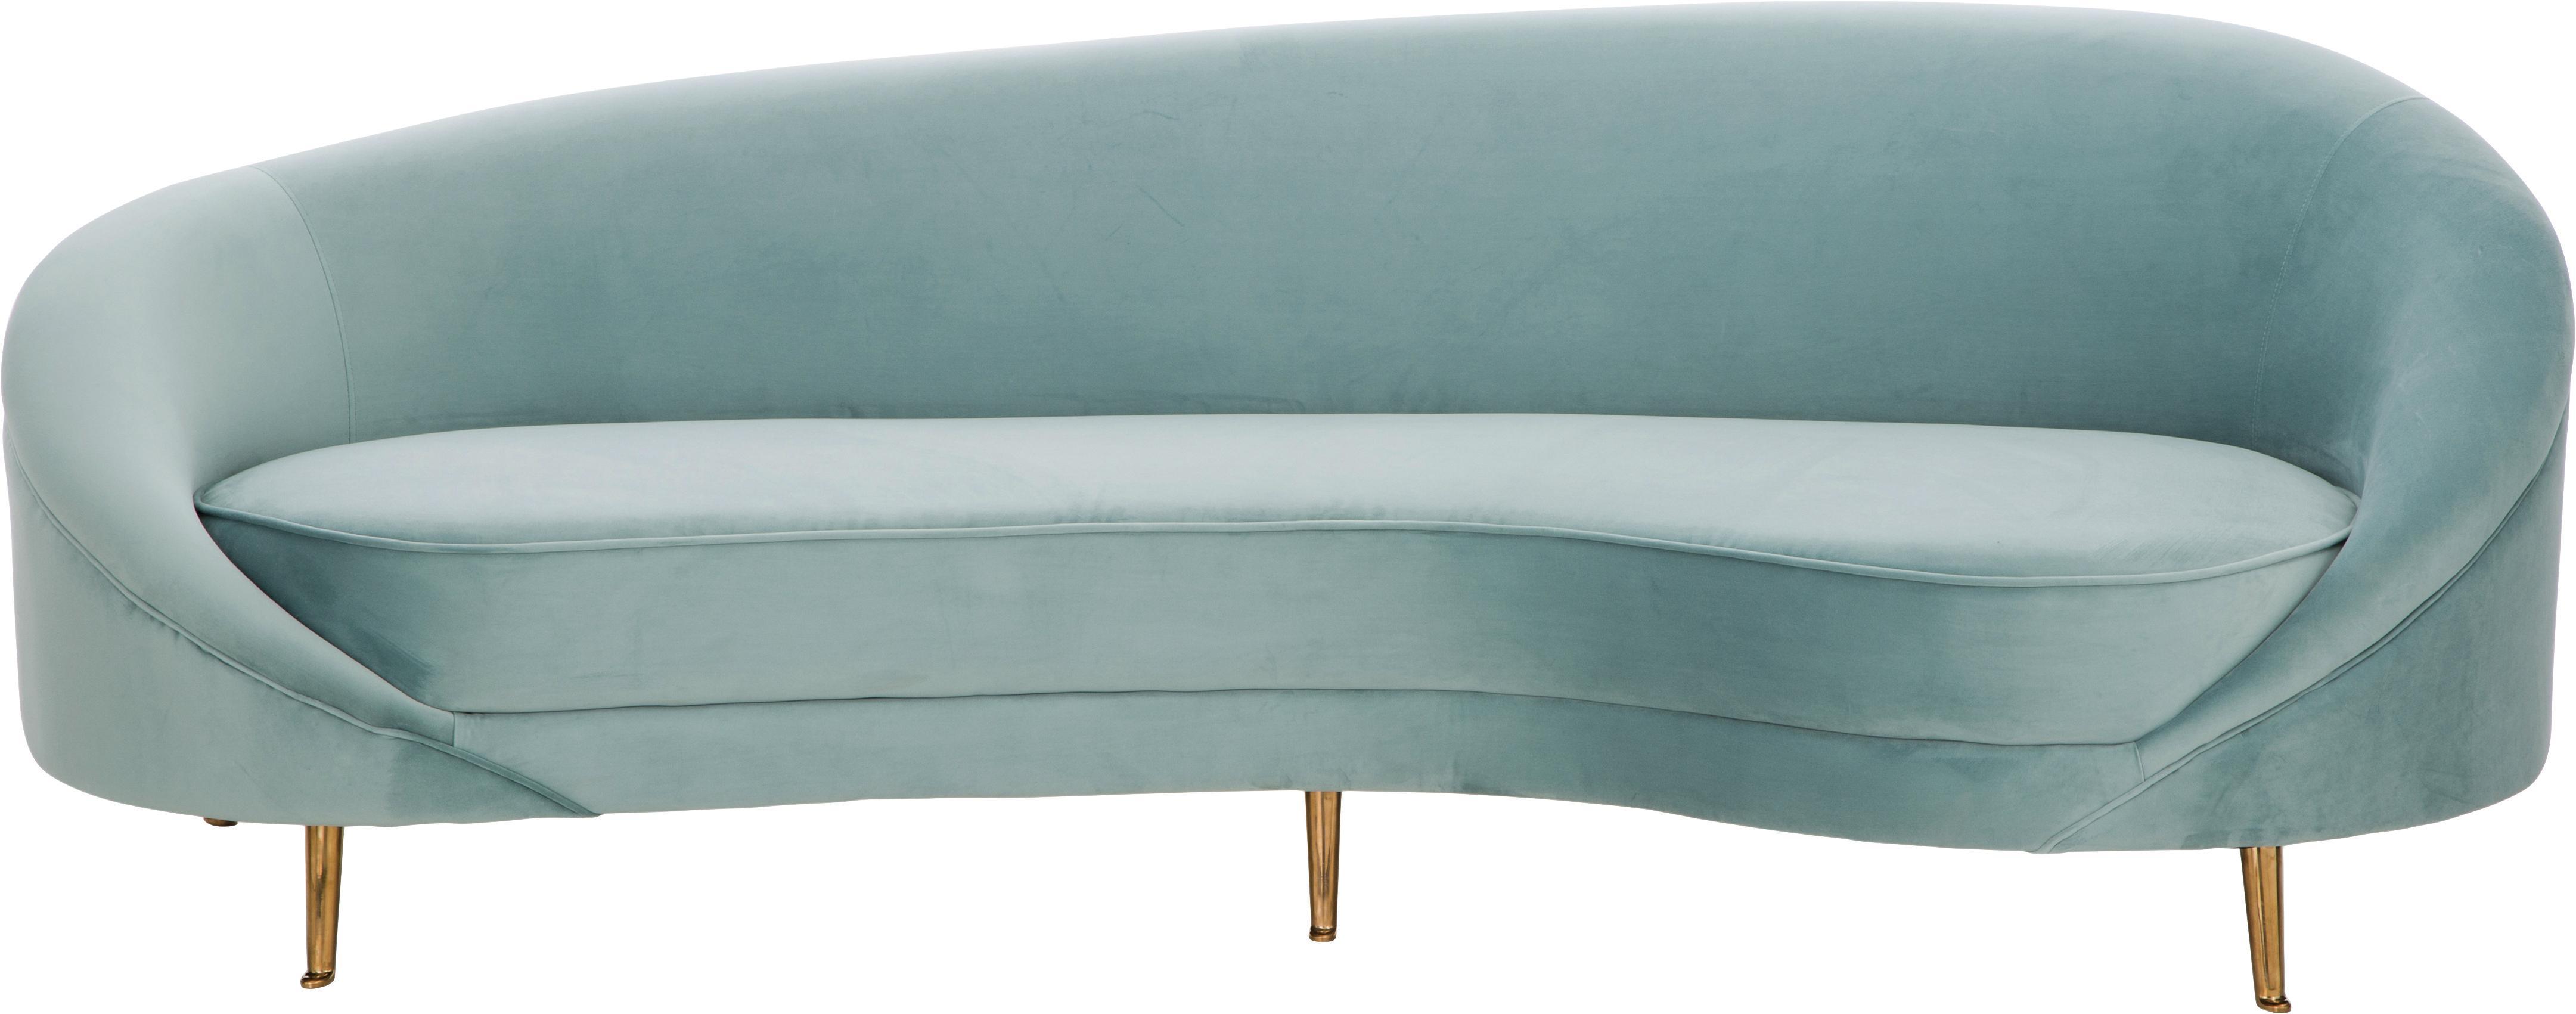 Fluwelen bank Gatsby (3-zits), Bekleding: fluweel (polyester), Frame: massief eucalyptushout, Poten: gegalvaniseerd metaal, Bekleding: turquoise. Poten: glanzend goudkleurig, B 245 x D 102 cm